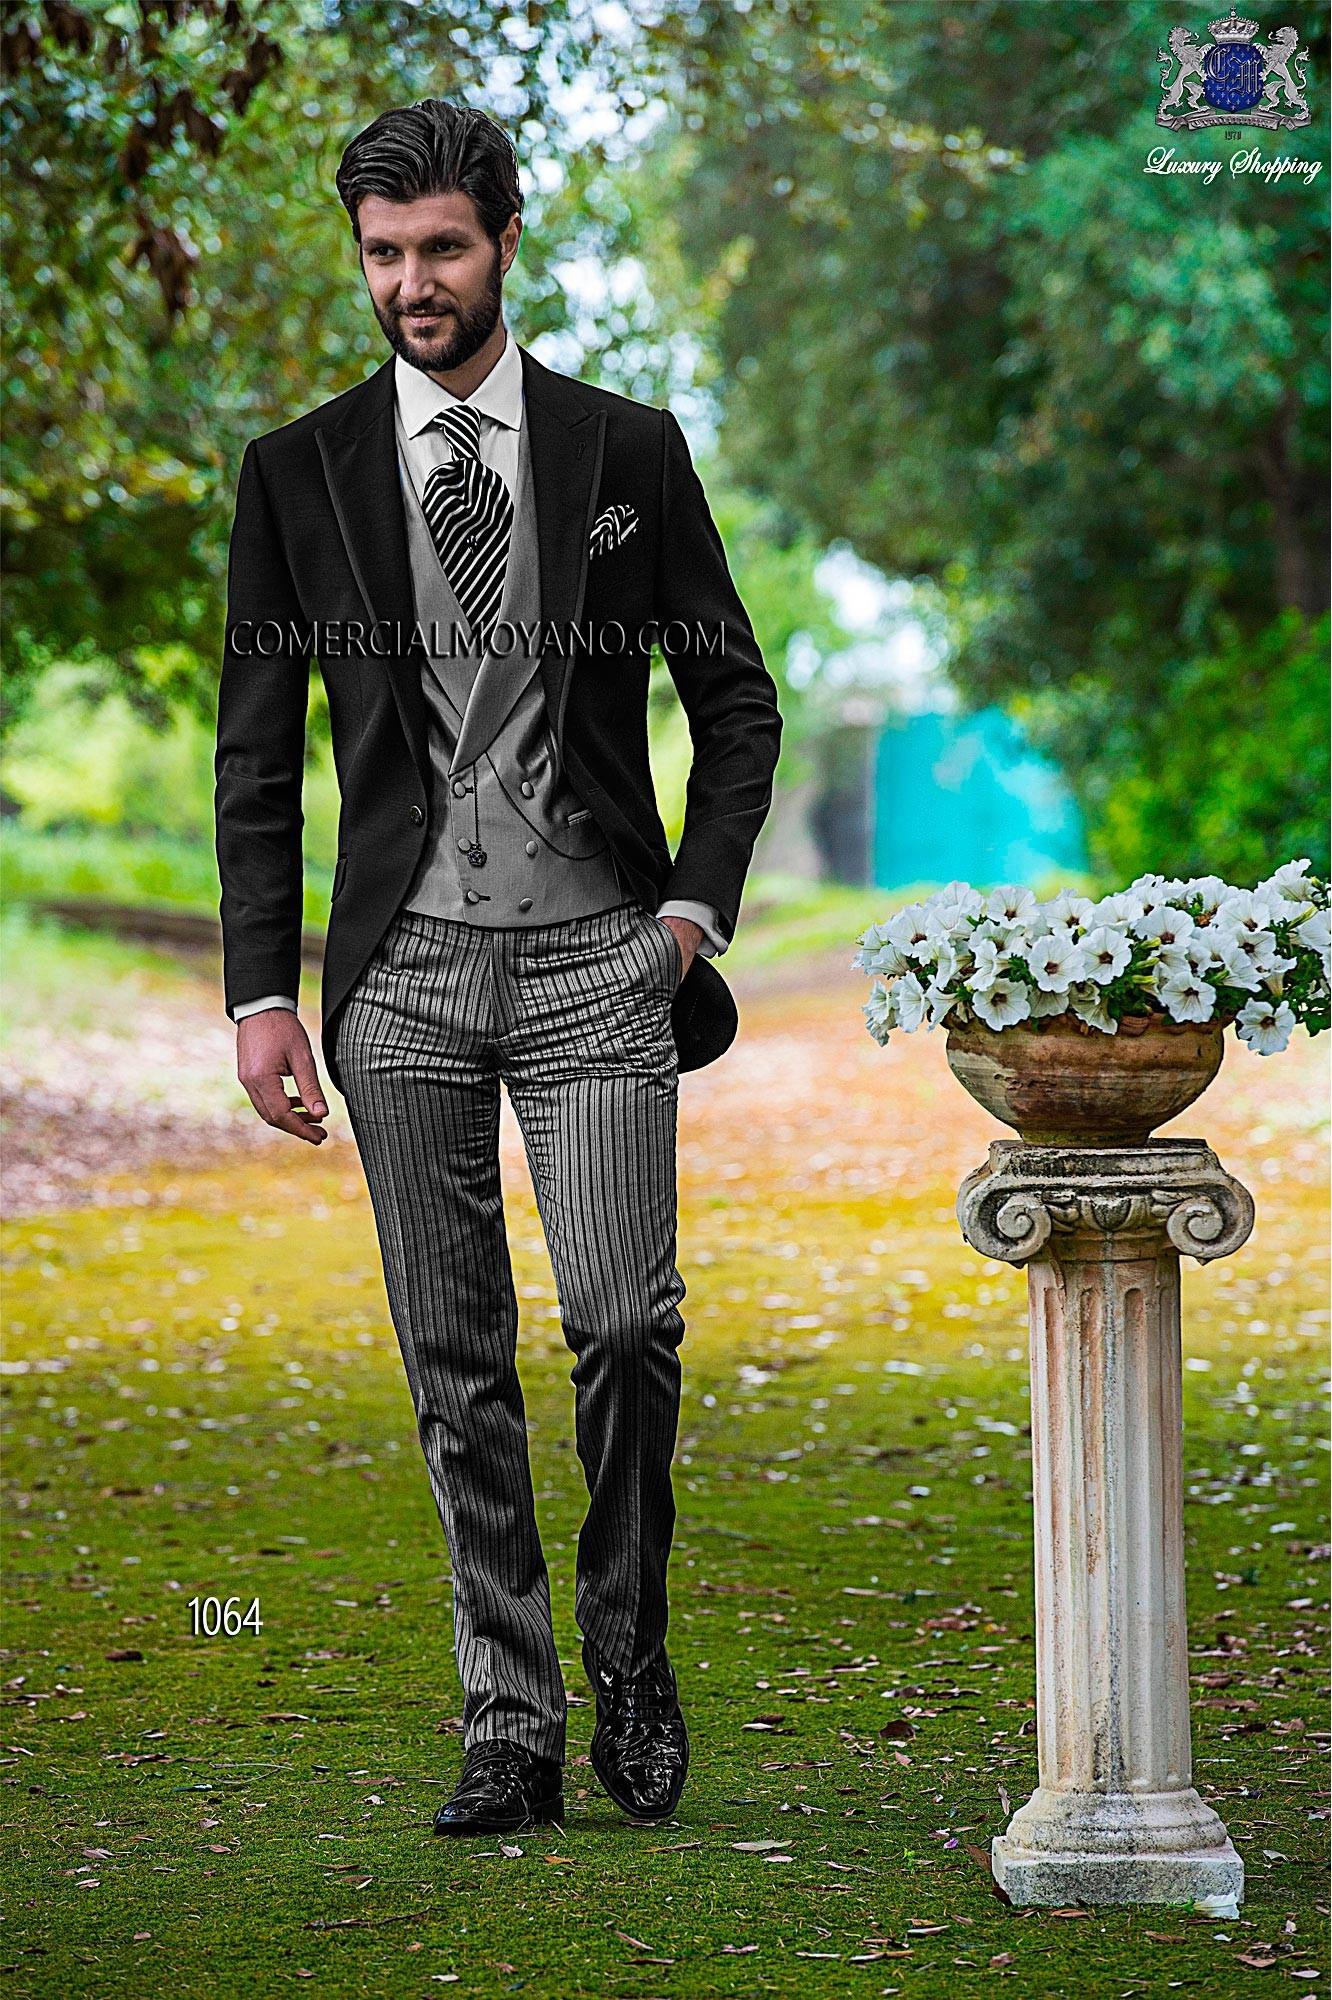 Traje de novio moderno negro modelo: 1064 Ottavio Nuccio Gala colección Fashion